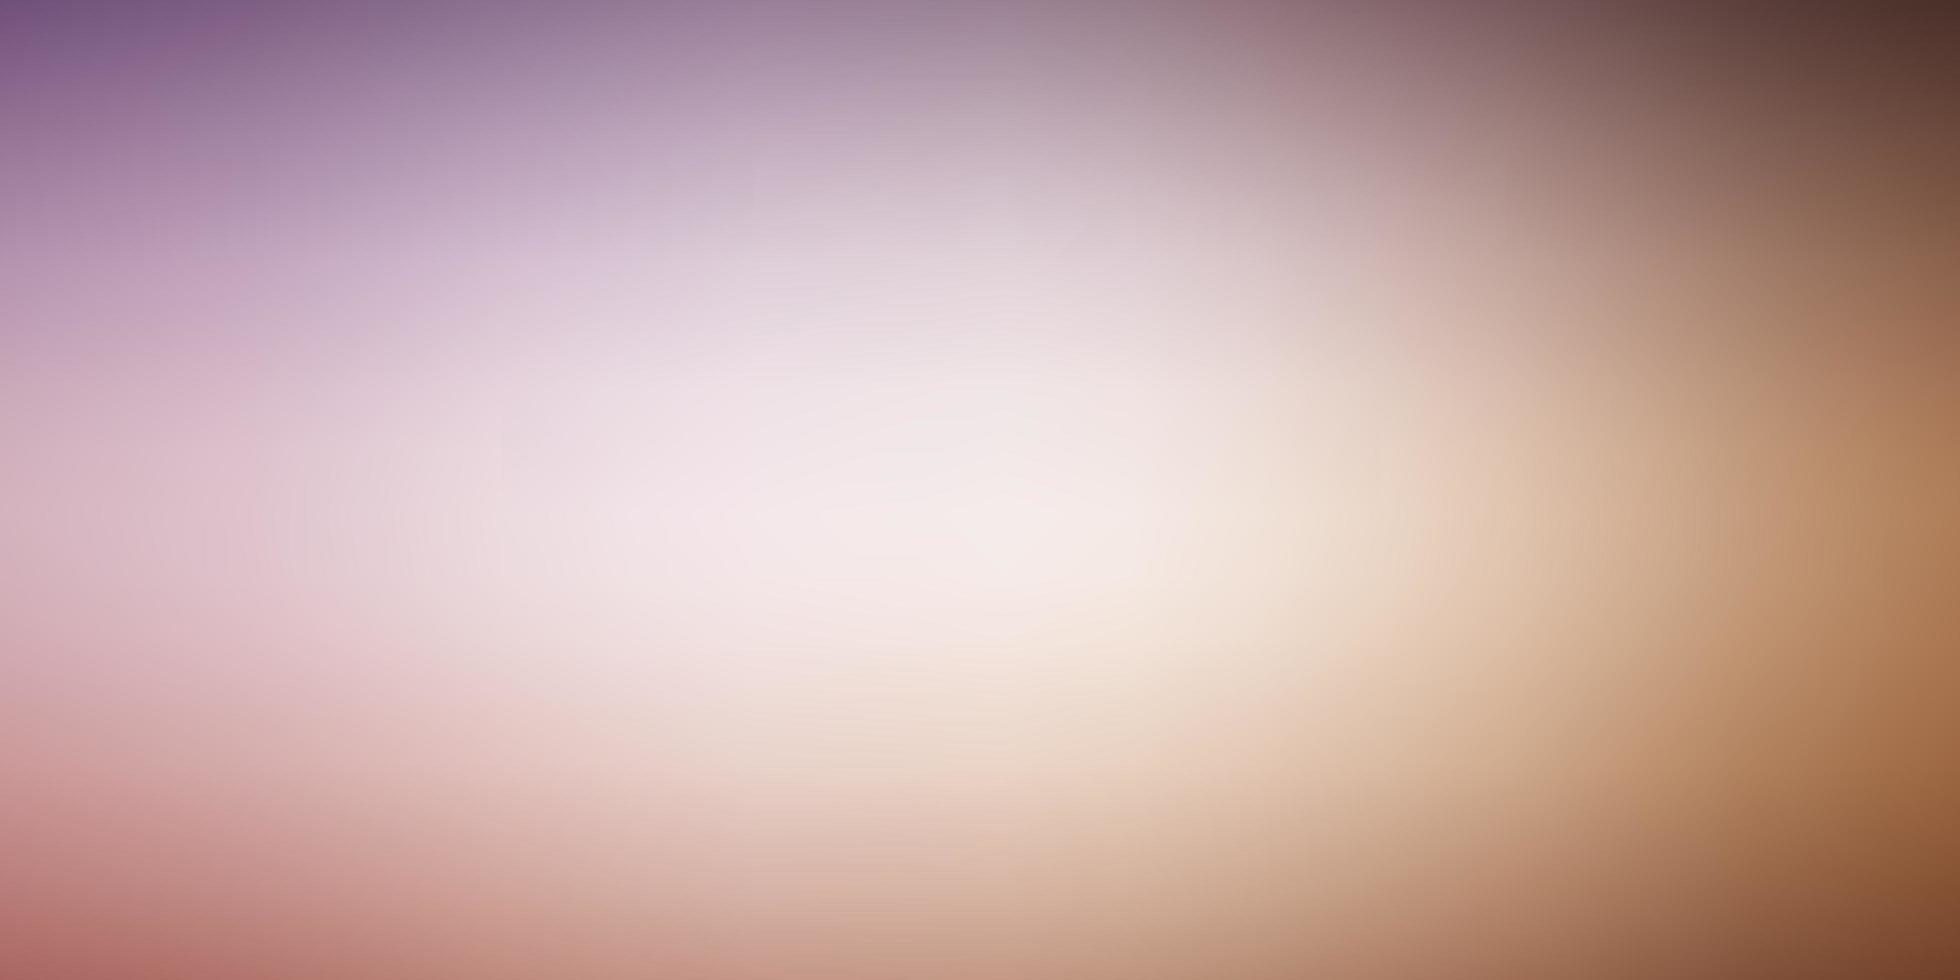 ljuslila, rosa vektor modern suddig bakgrund.